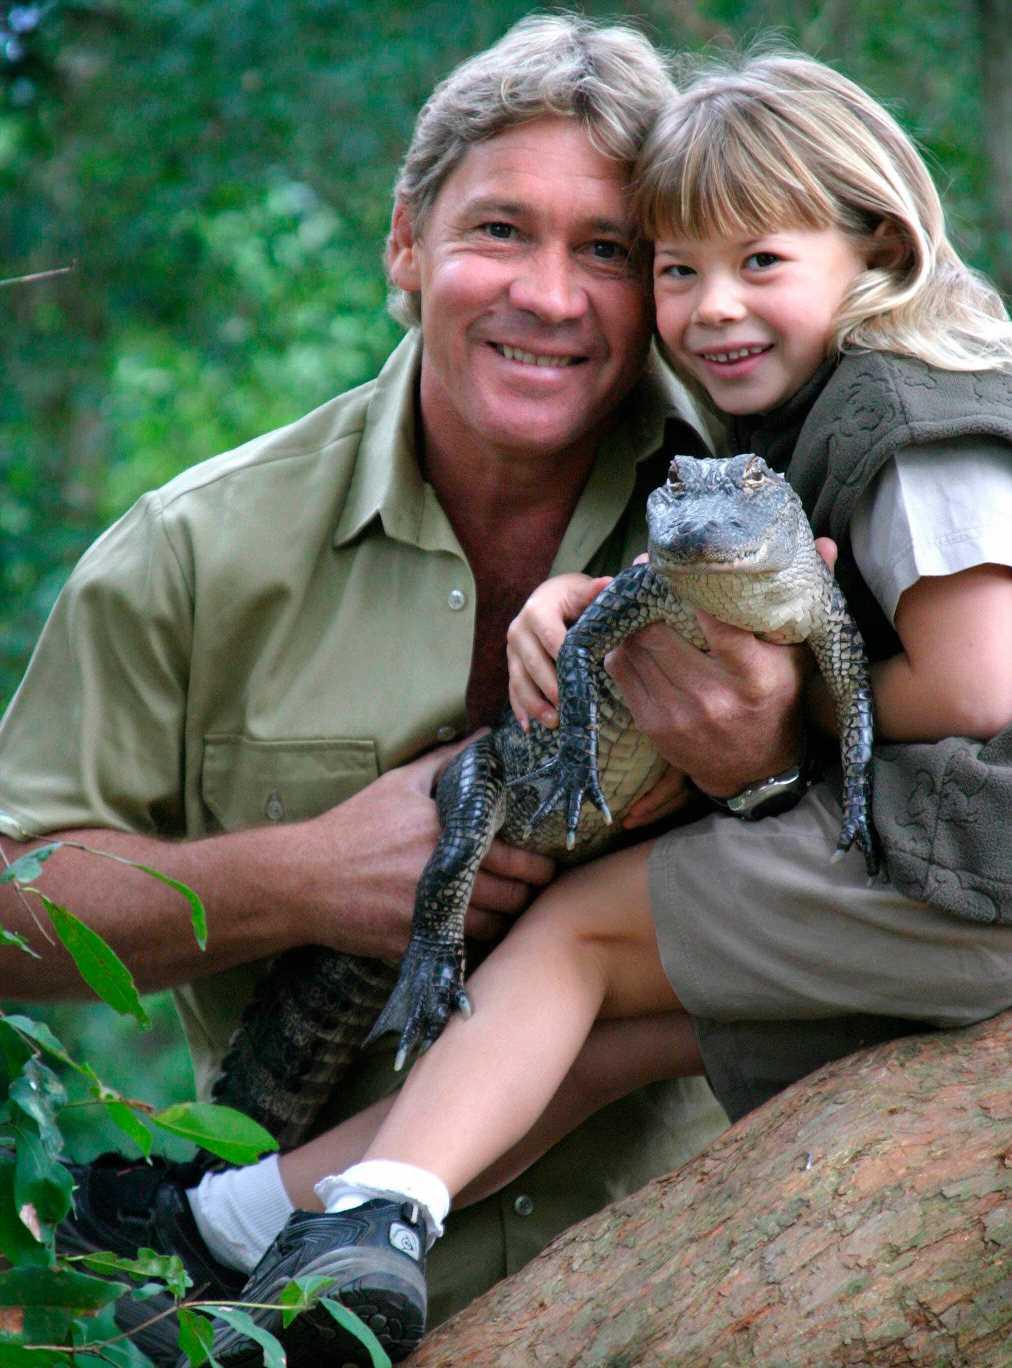 Bindi Irwin Reveals She Still Cries Watching Footage of Late Father Steve Irwin